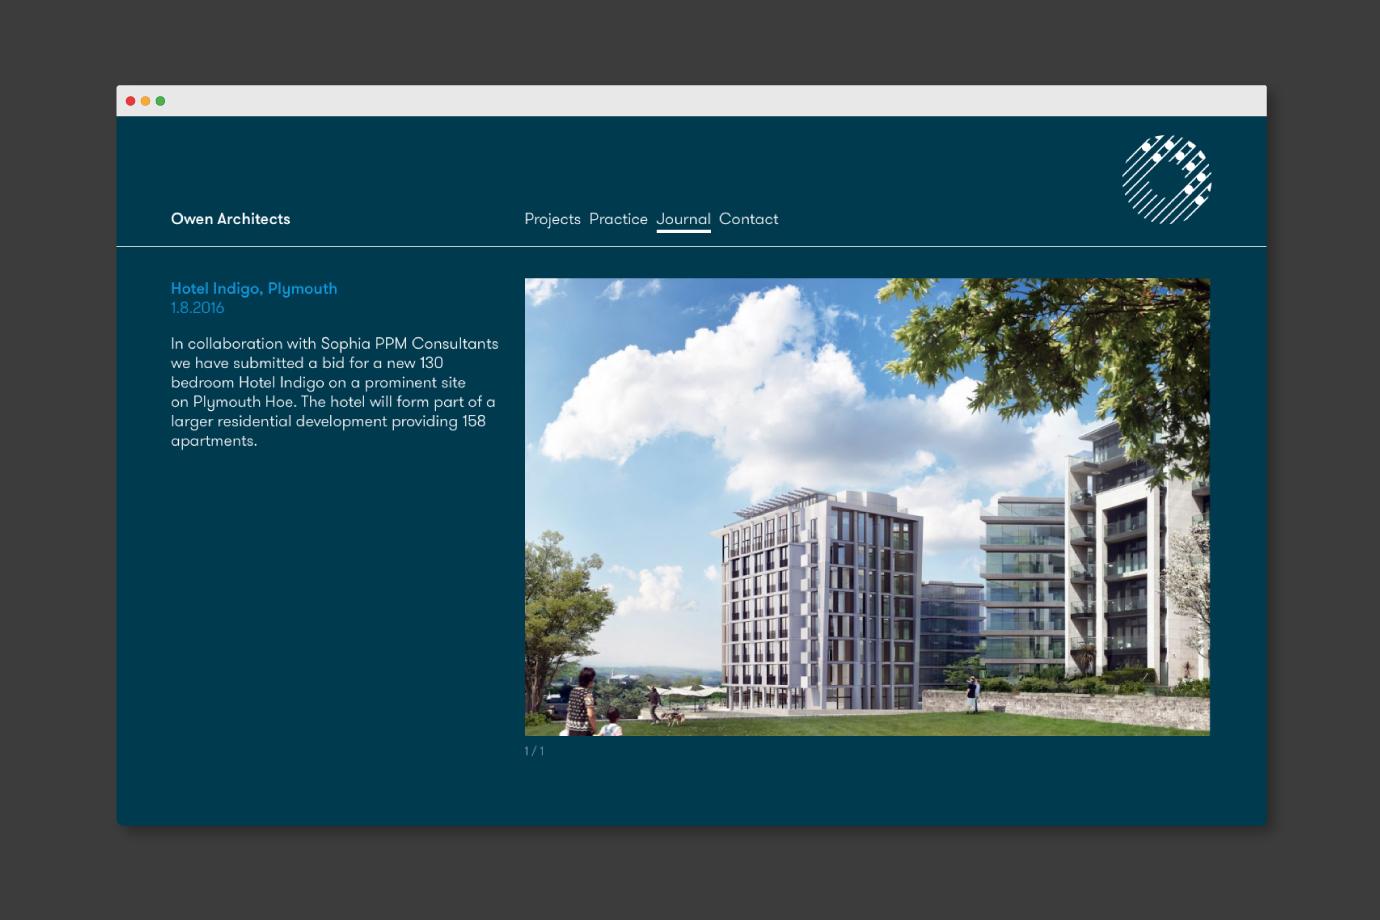 http://spystudio.co.uk/wp-content/uploads/2017/03/Owen_Architects_web-3.jpg